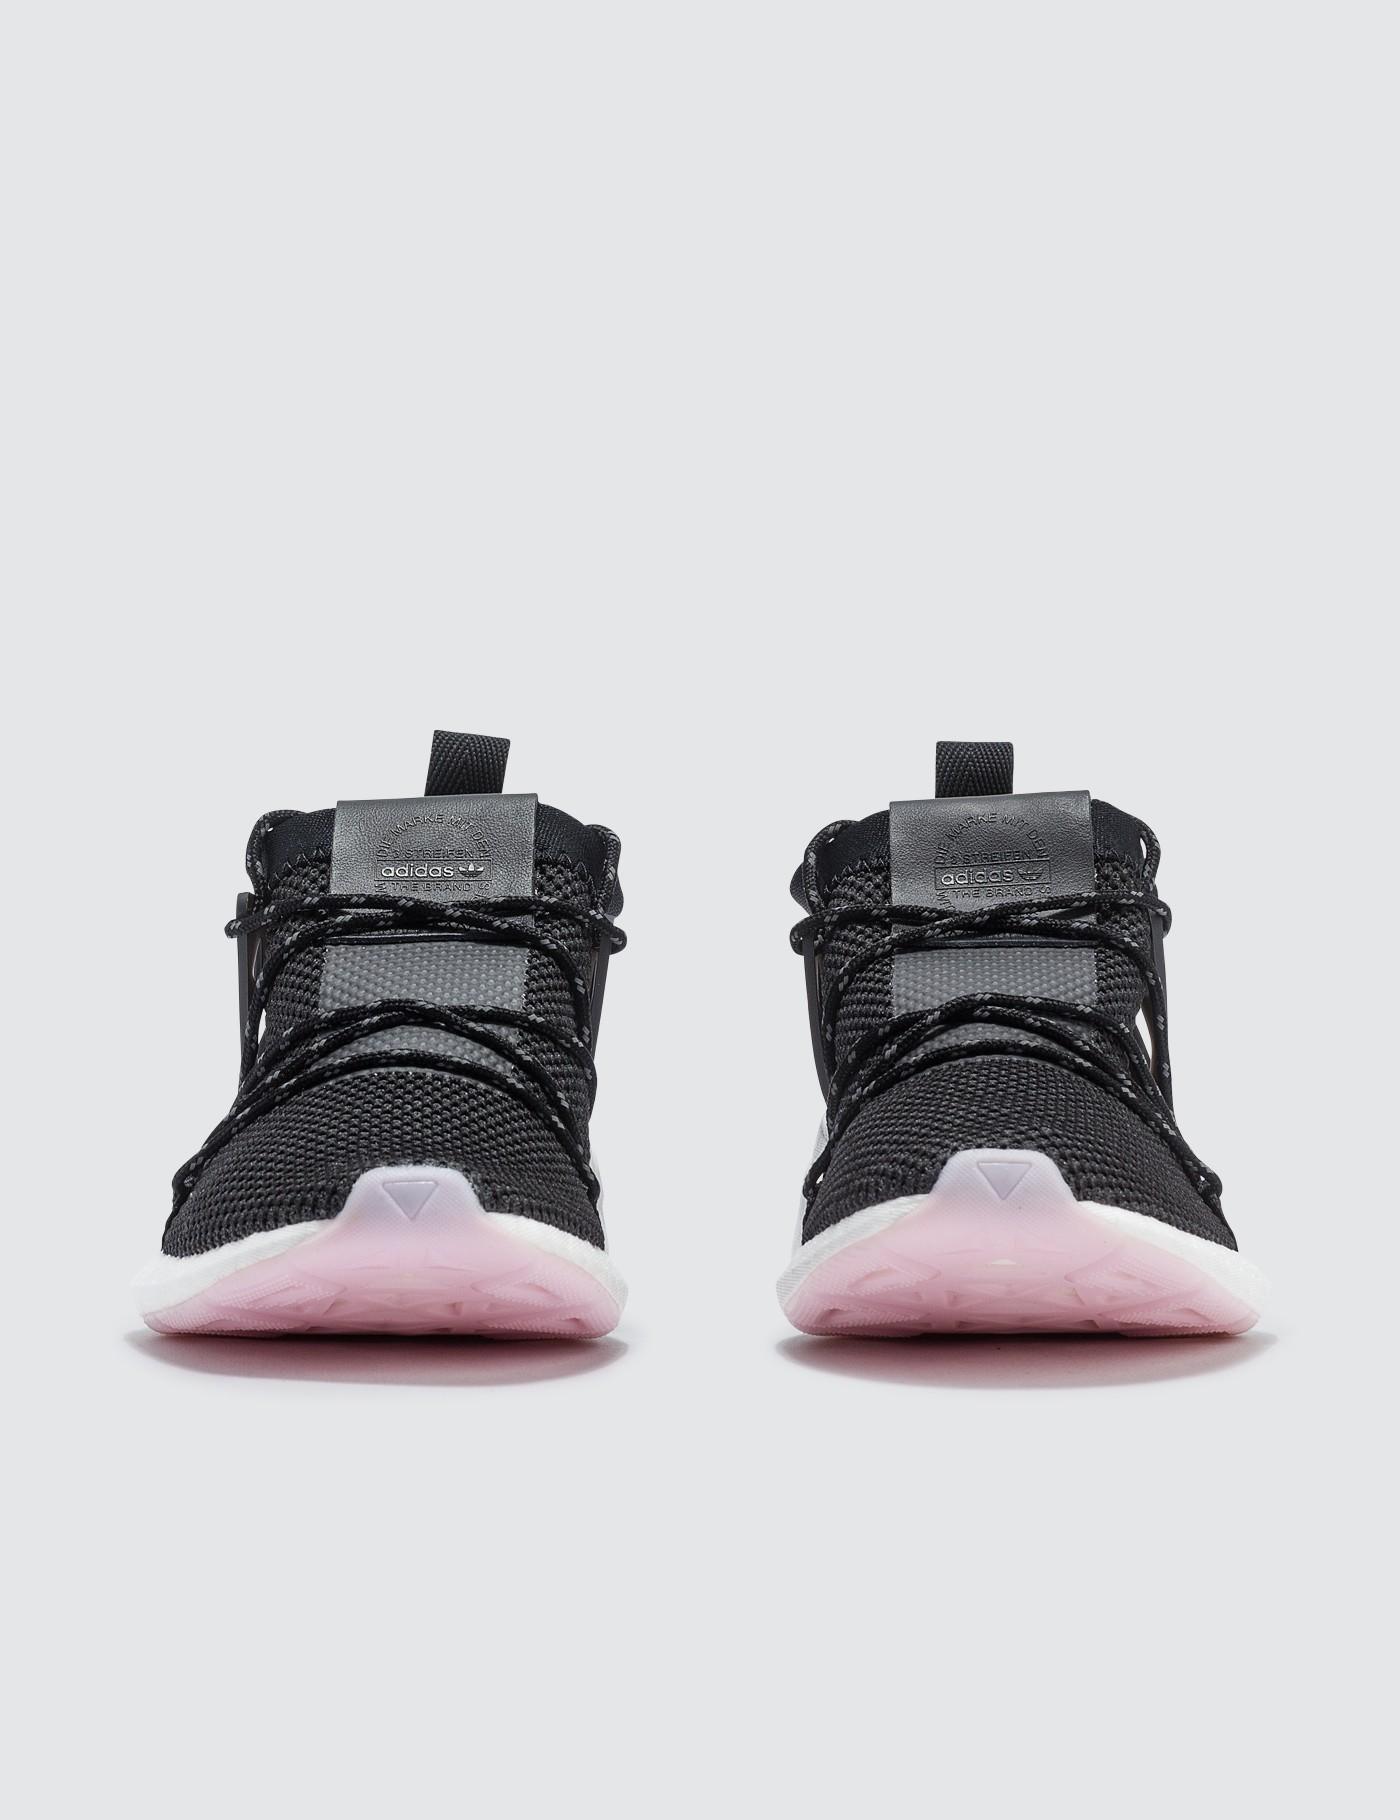 timeless design d8a83 74d92 adidas Originals Arkyn Knit W in Black - Lyst